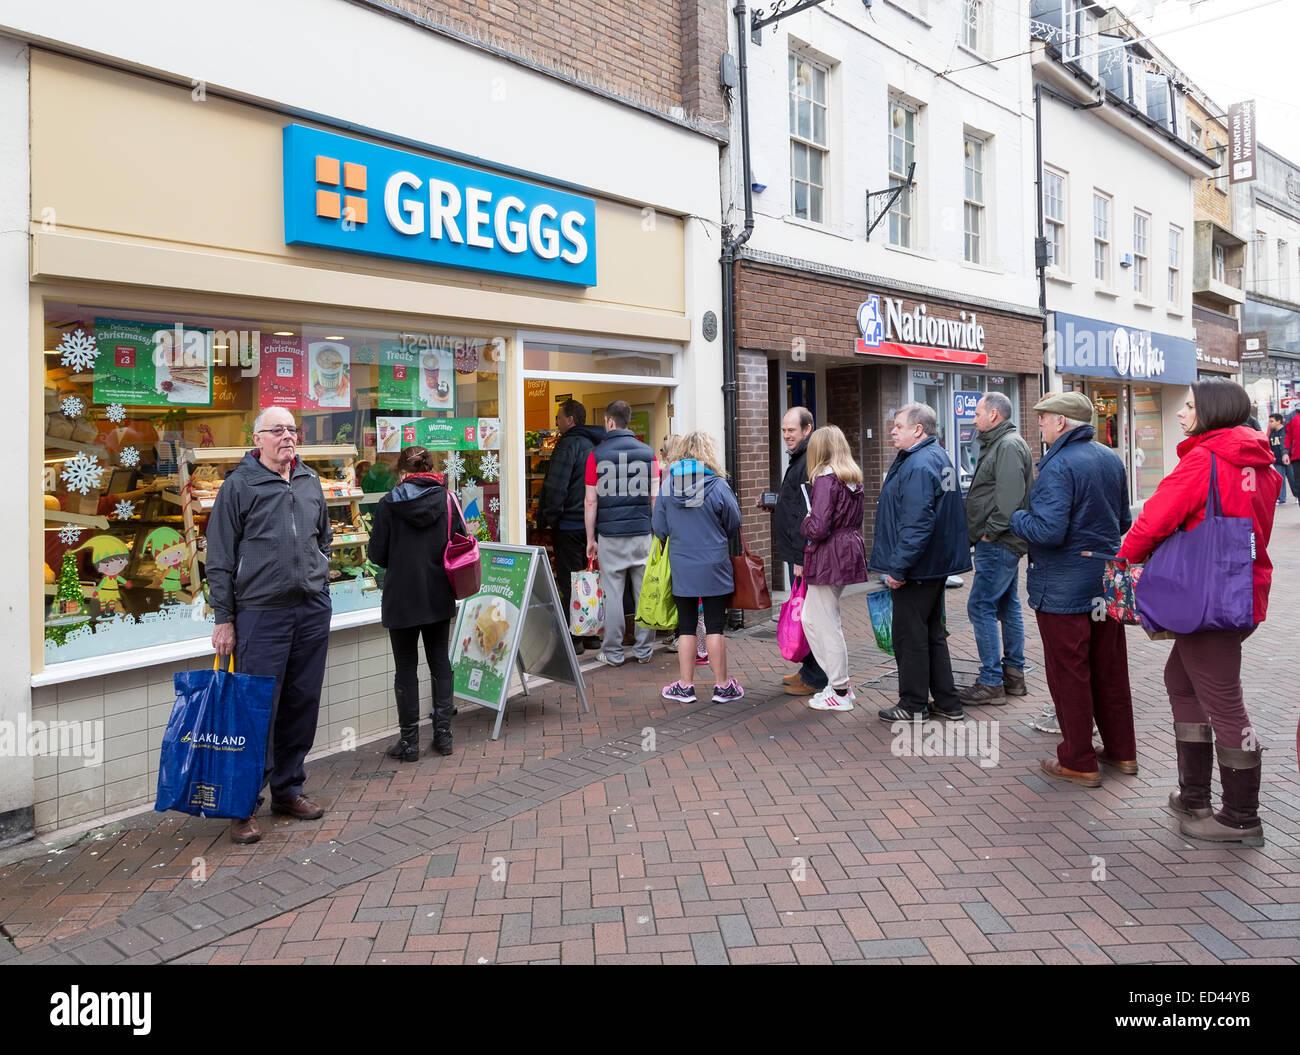 Queue outside Greggs bakers, Abergavenny, Wales, UK - Stock Image